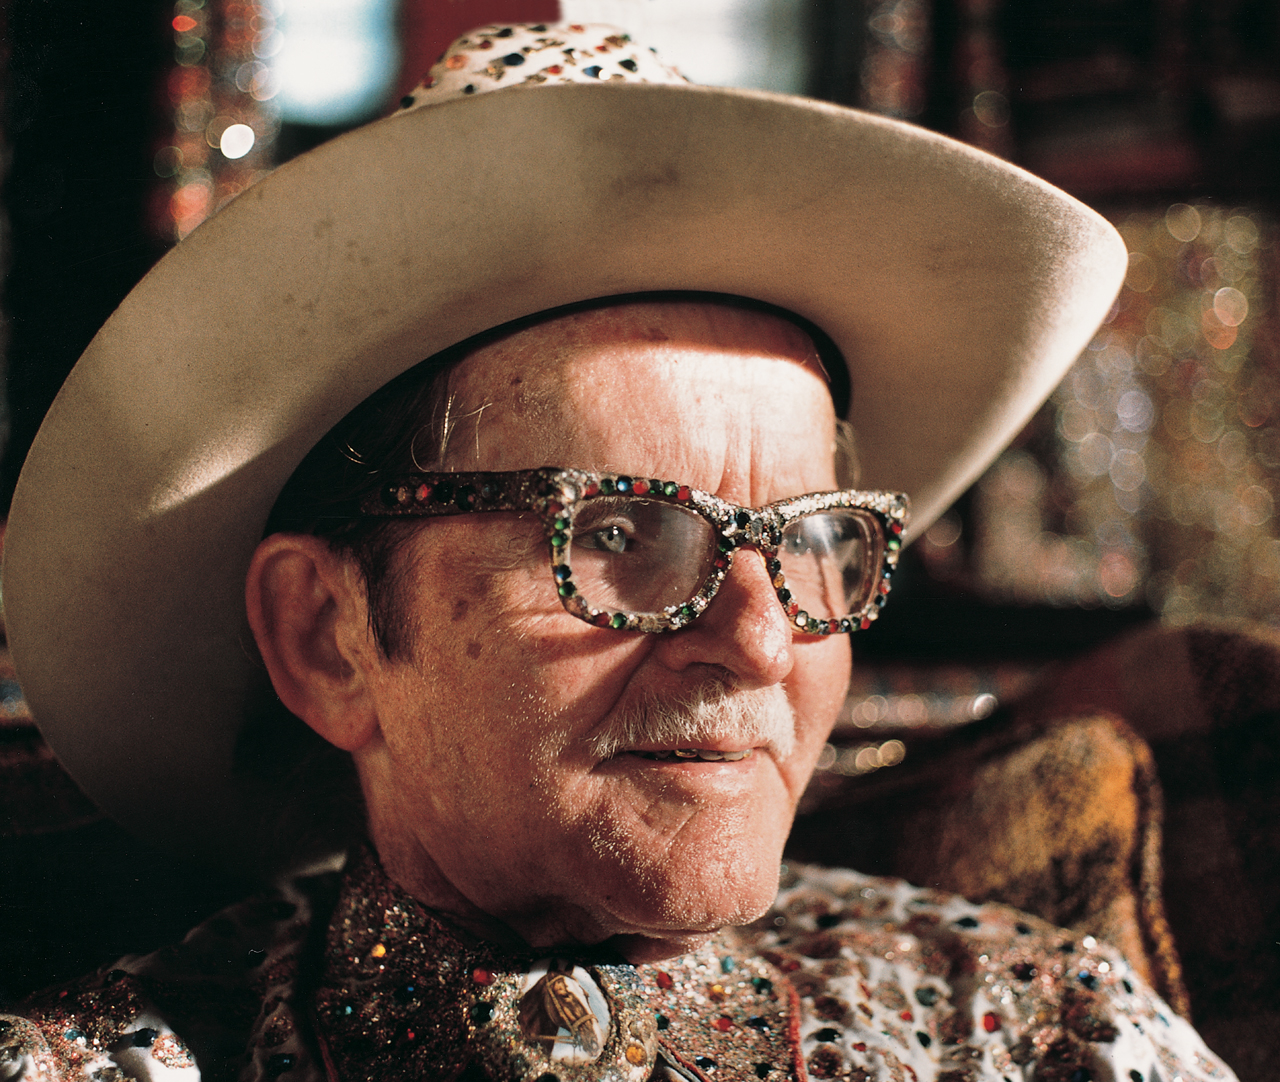 The Original Rhinestone Cowboy S Glittery Home Will Be